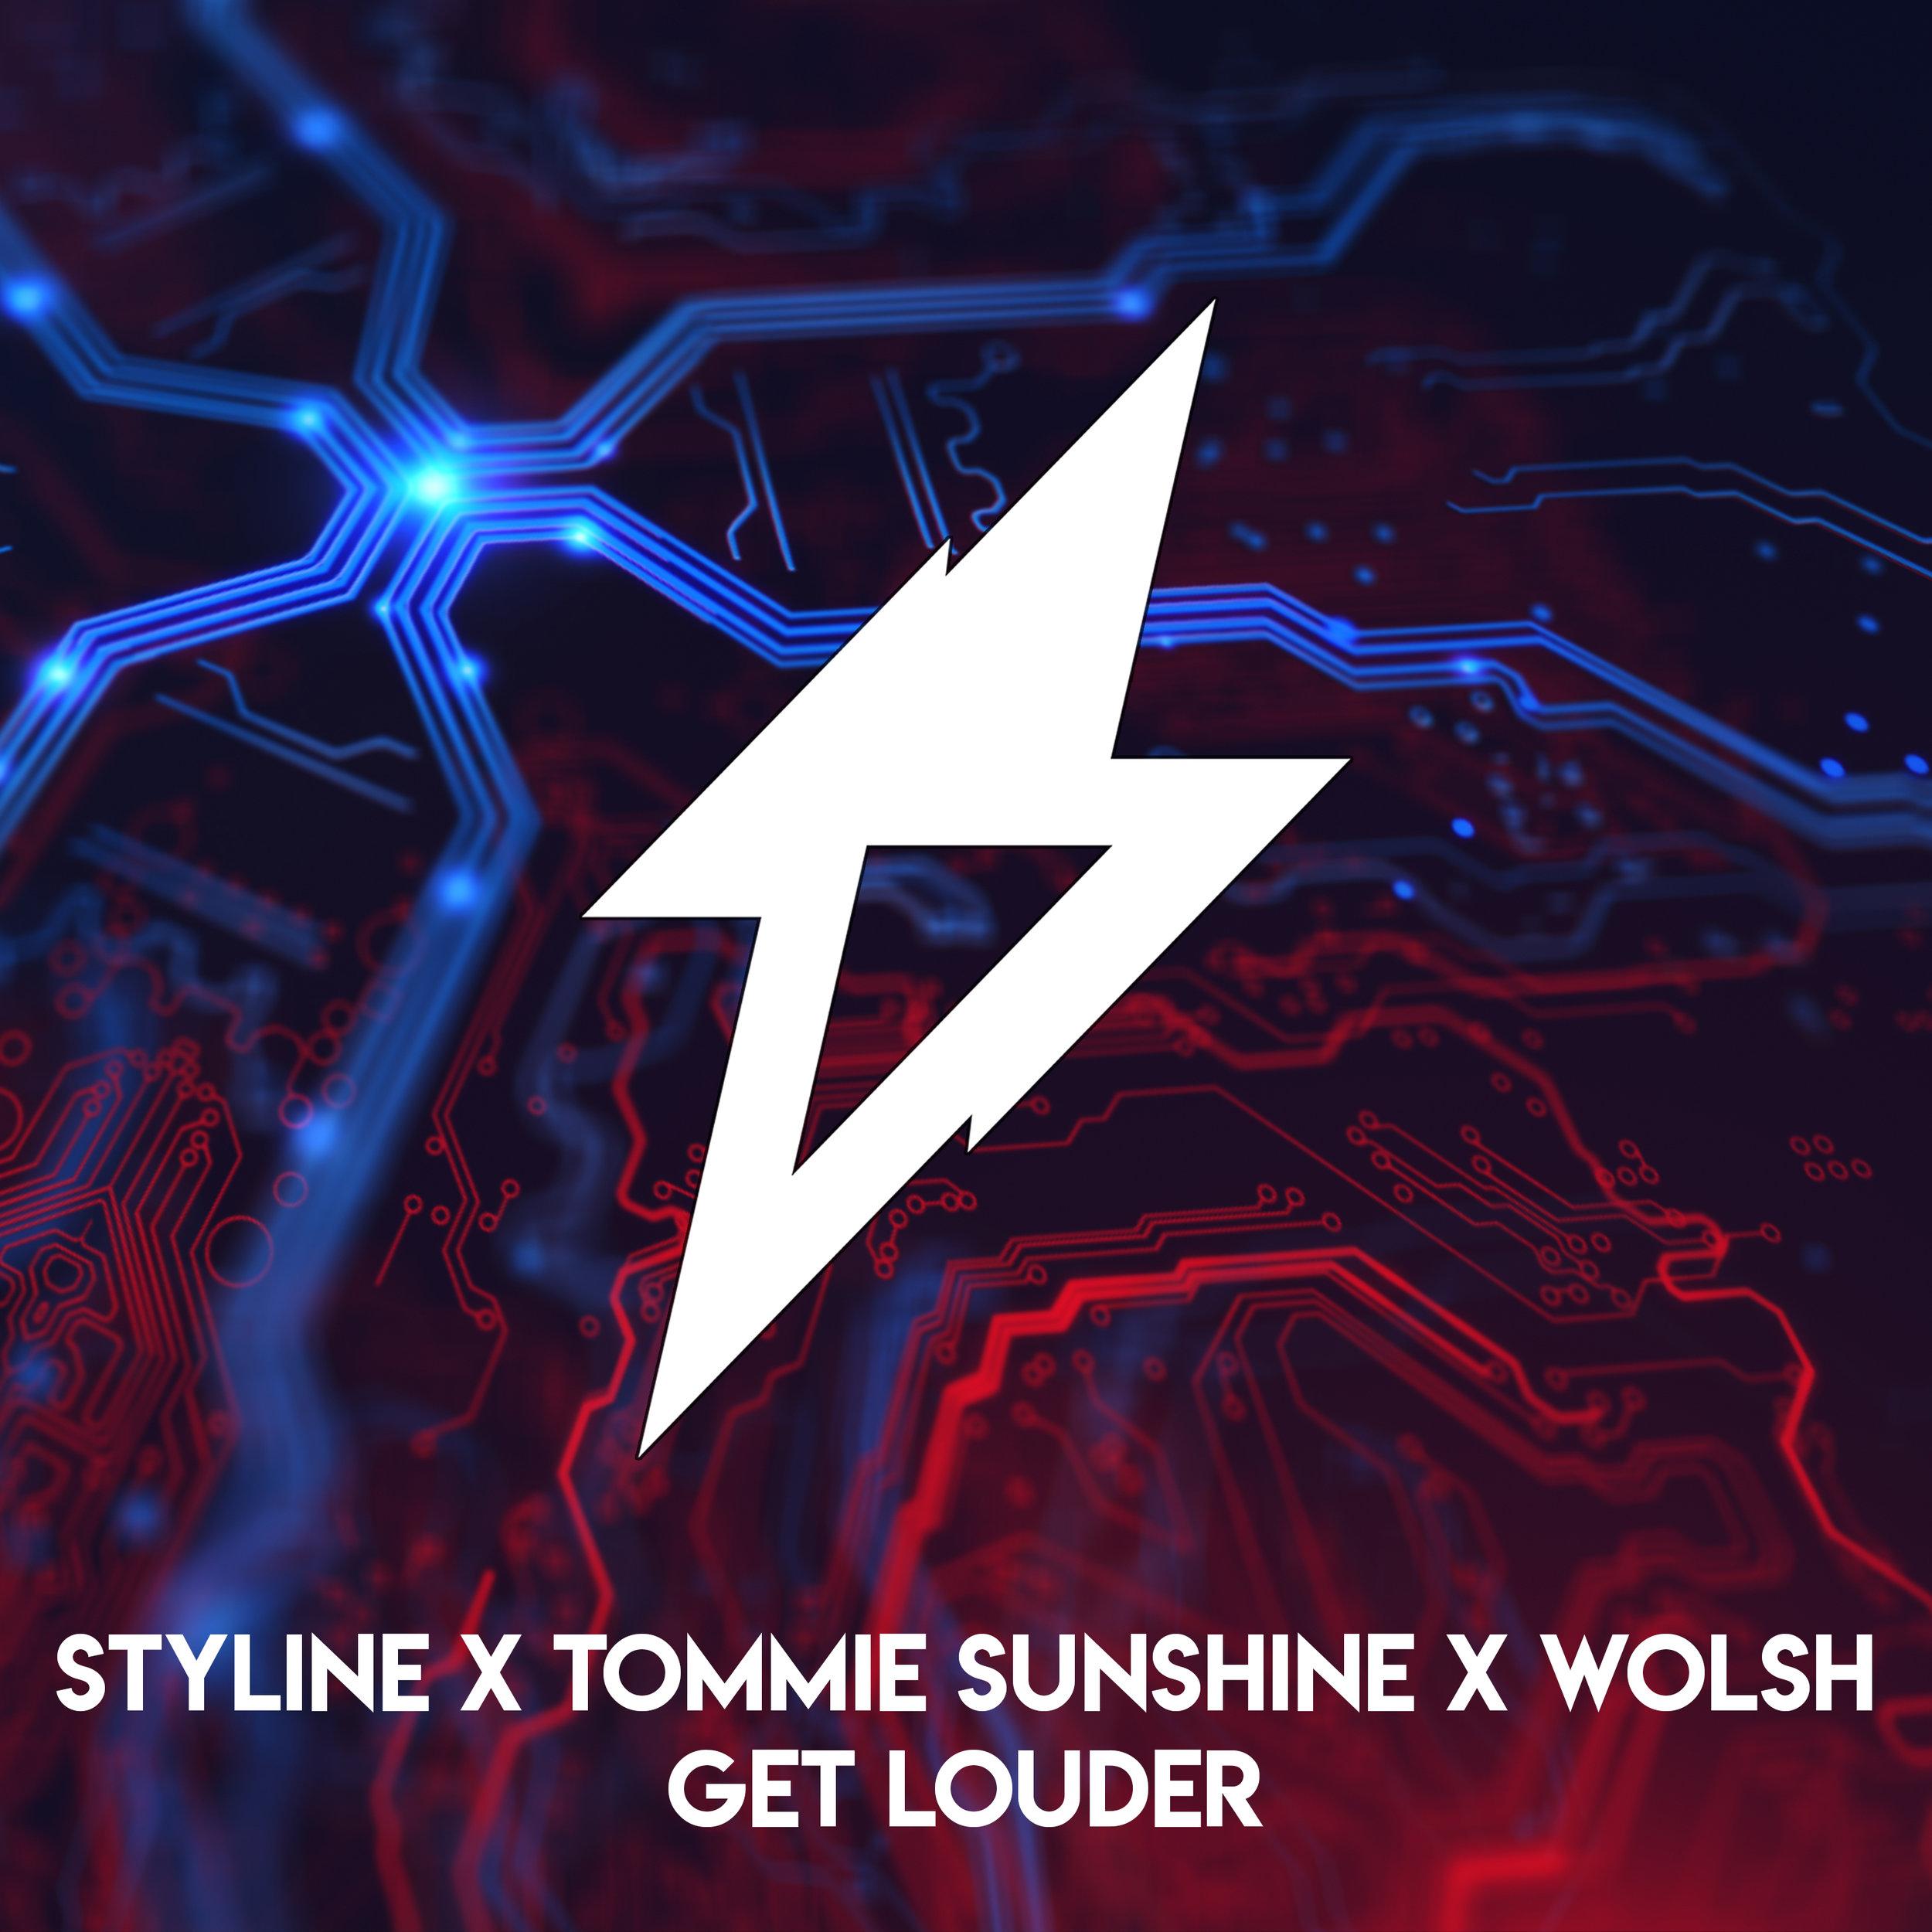 Styline X Tommie Sunshine X Wolsh - Get Louder.jpg